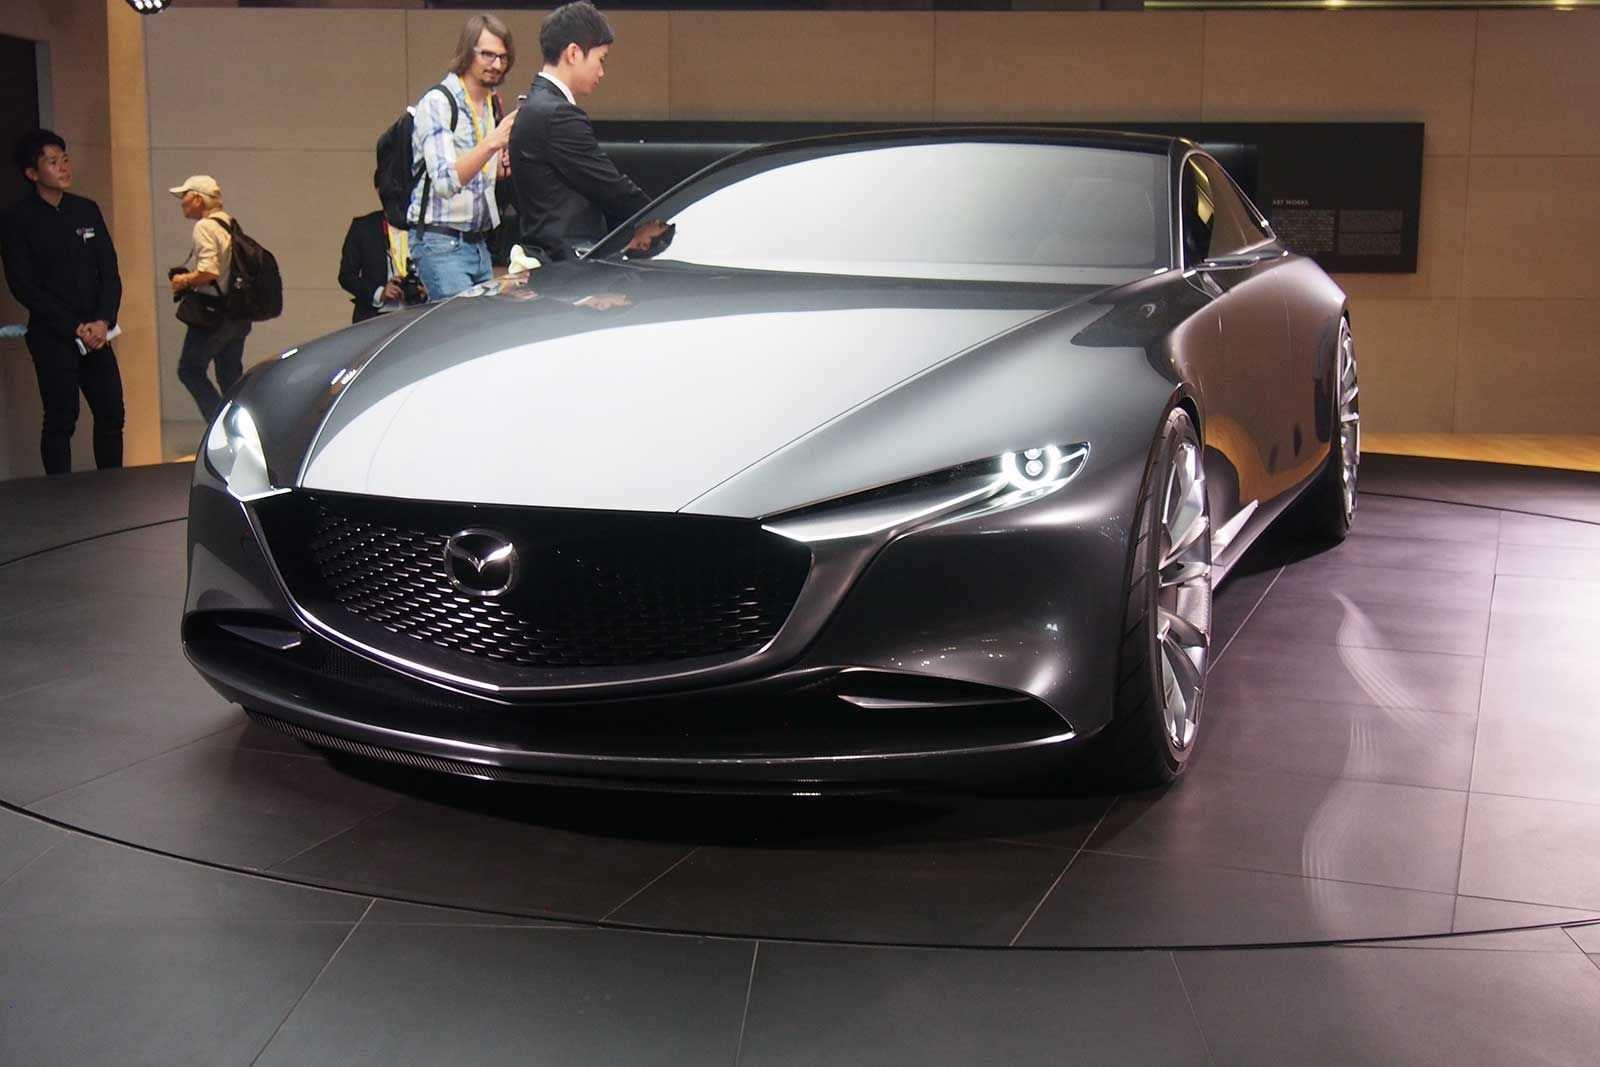 17 New The 2019 Mazda Vision Coupe Price Concept Review by The 2019 Mazda Vision Coupe Price Concept